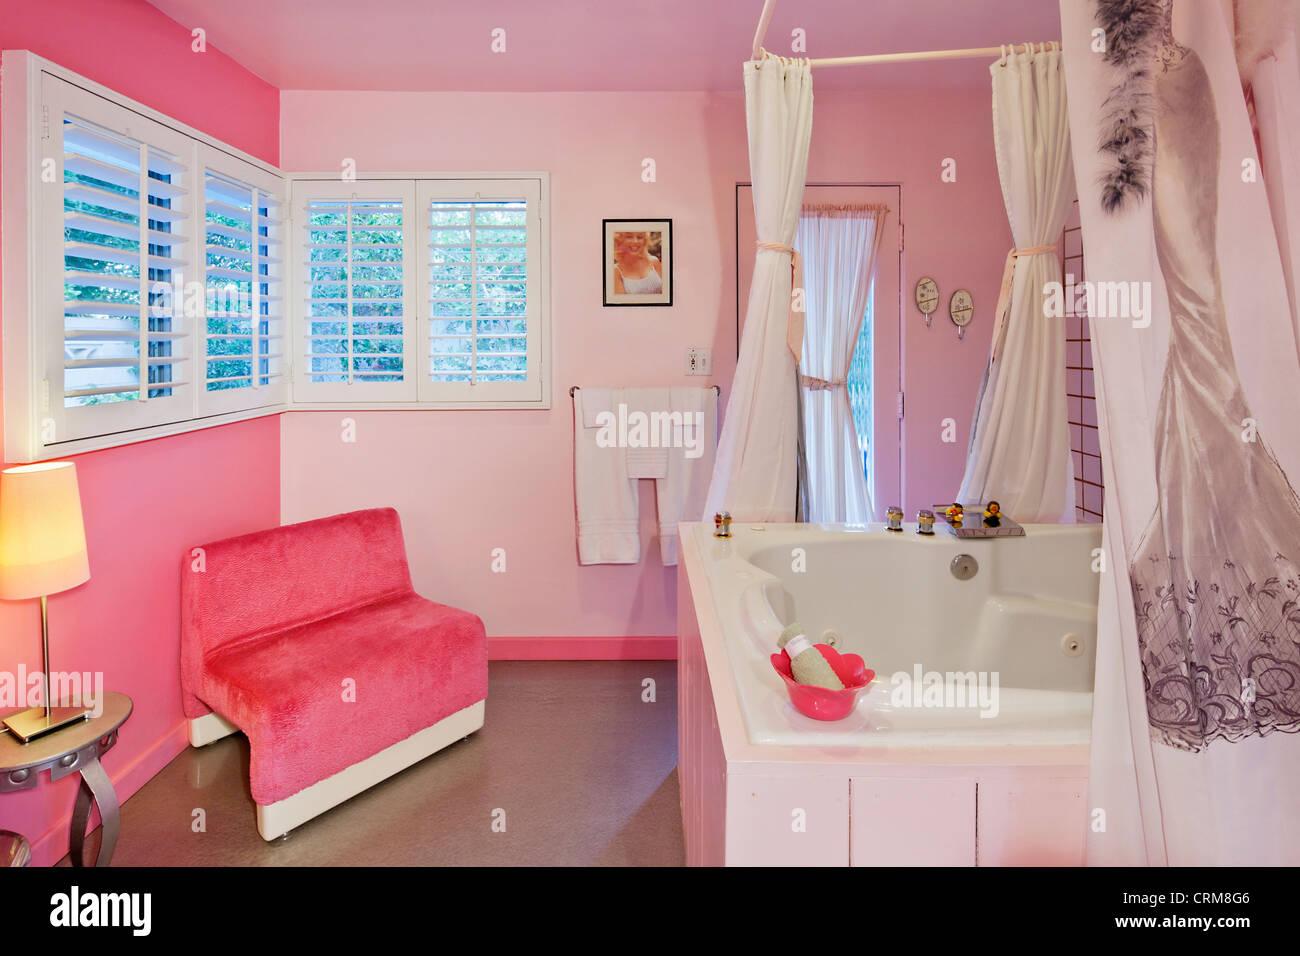 Luxurious bathroom interior design - Stock Image